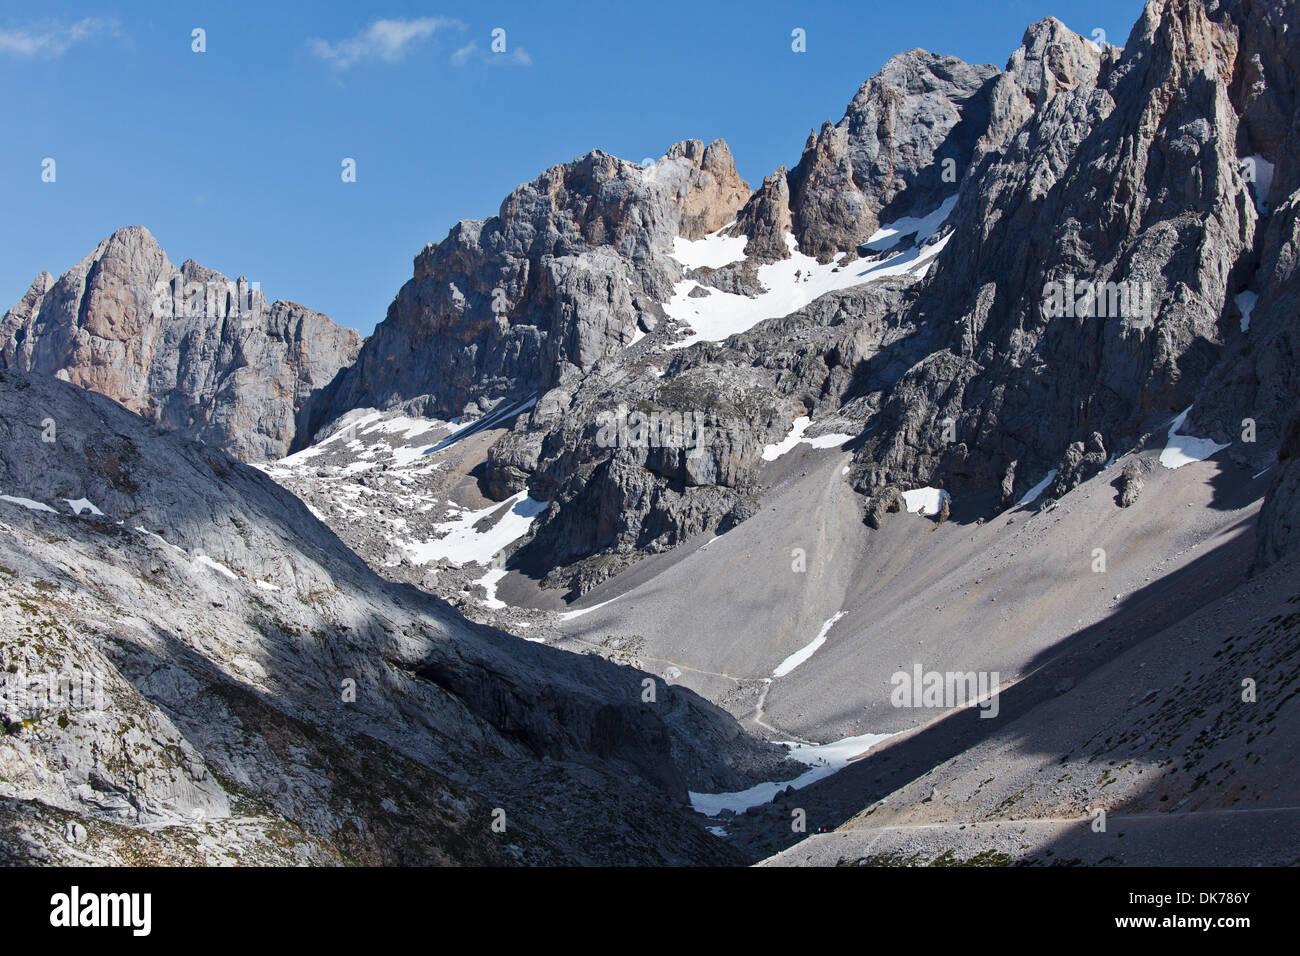 Picos de Europa, Cantabria, Spain - Stock Image